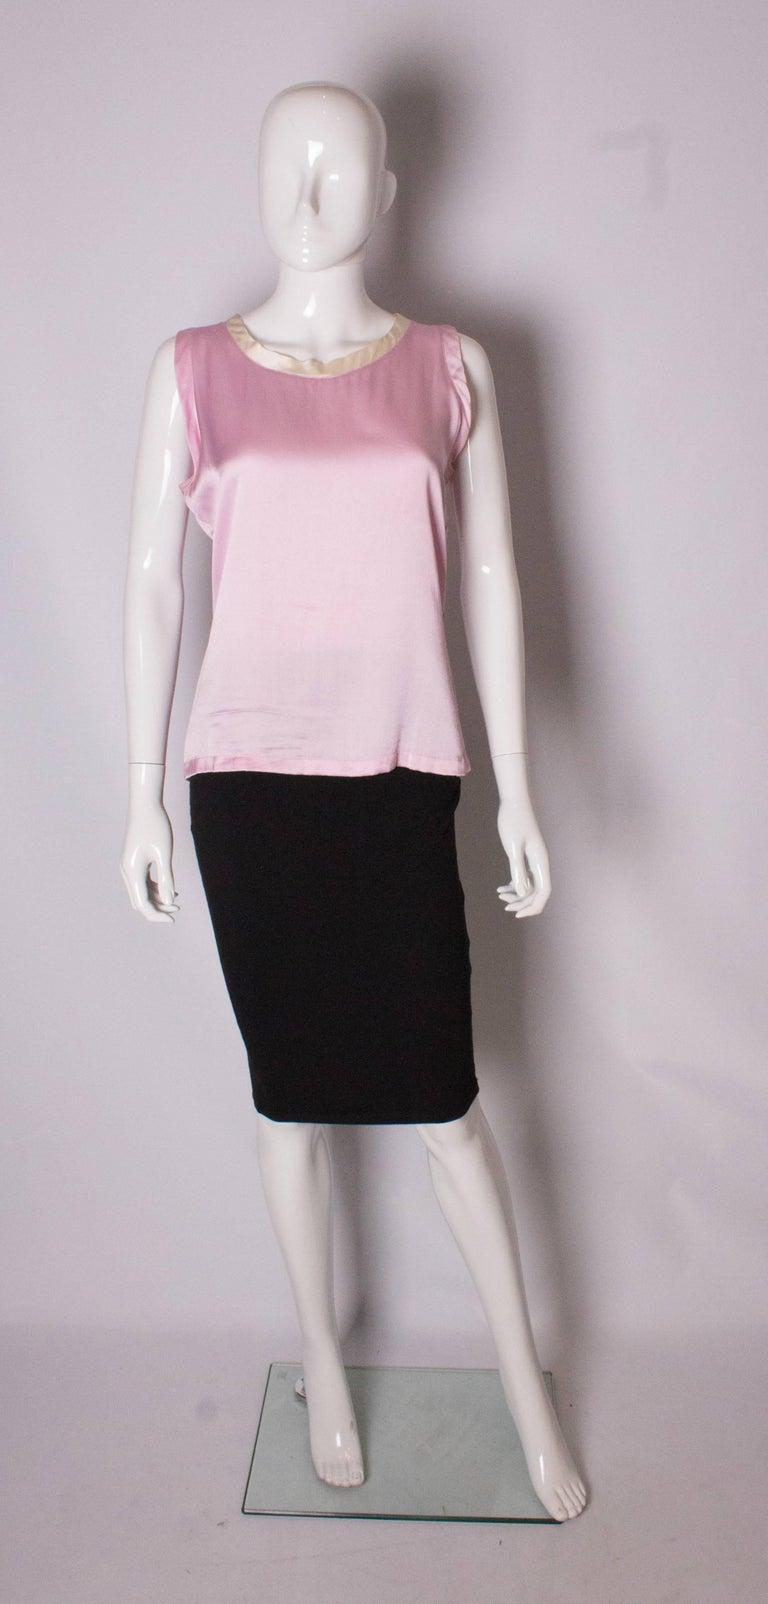 A pretty pink silk top by Yves Saint Laurent Rive Gauche. The top has a white silk trim around the neckline.